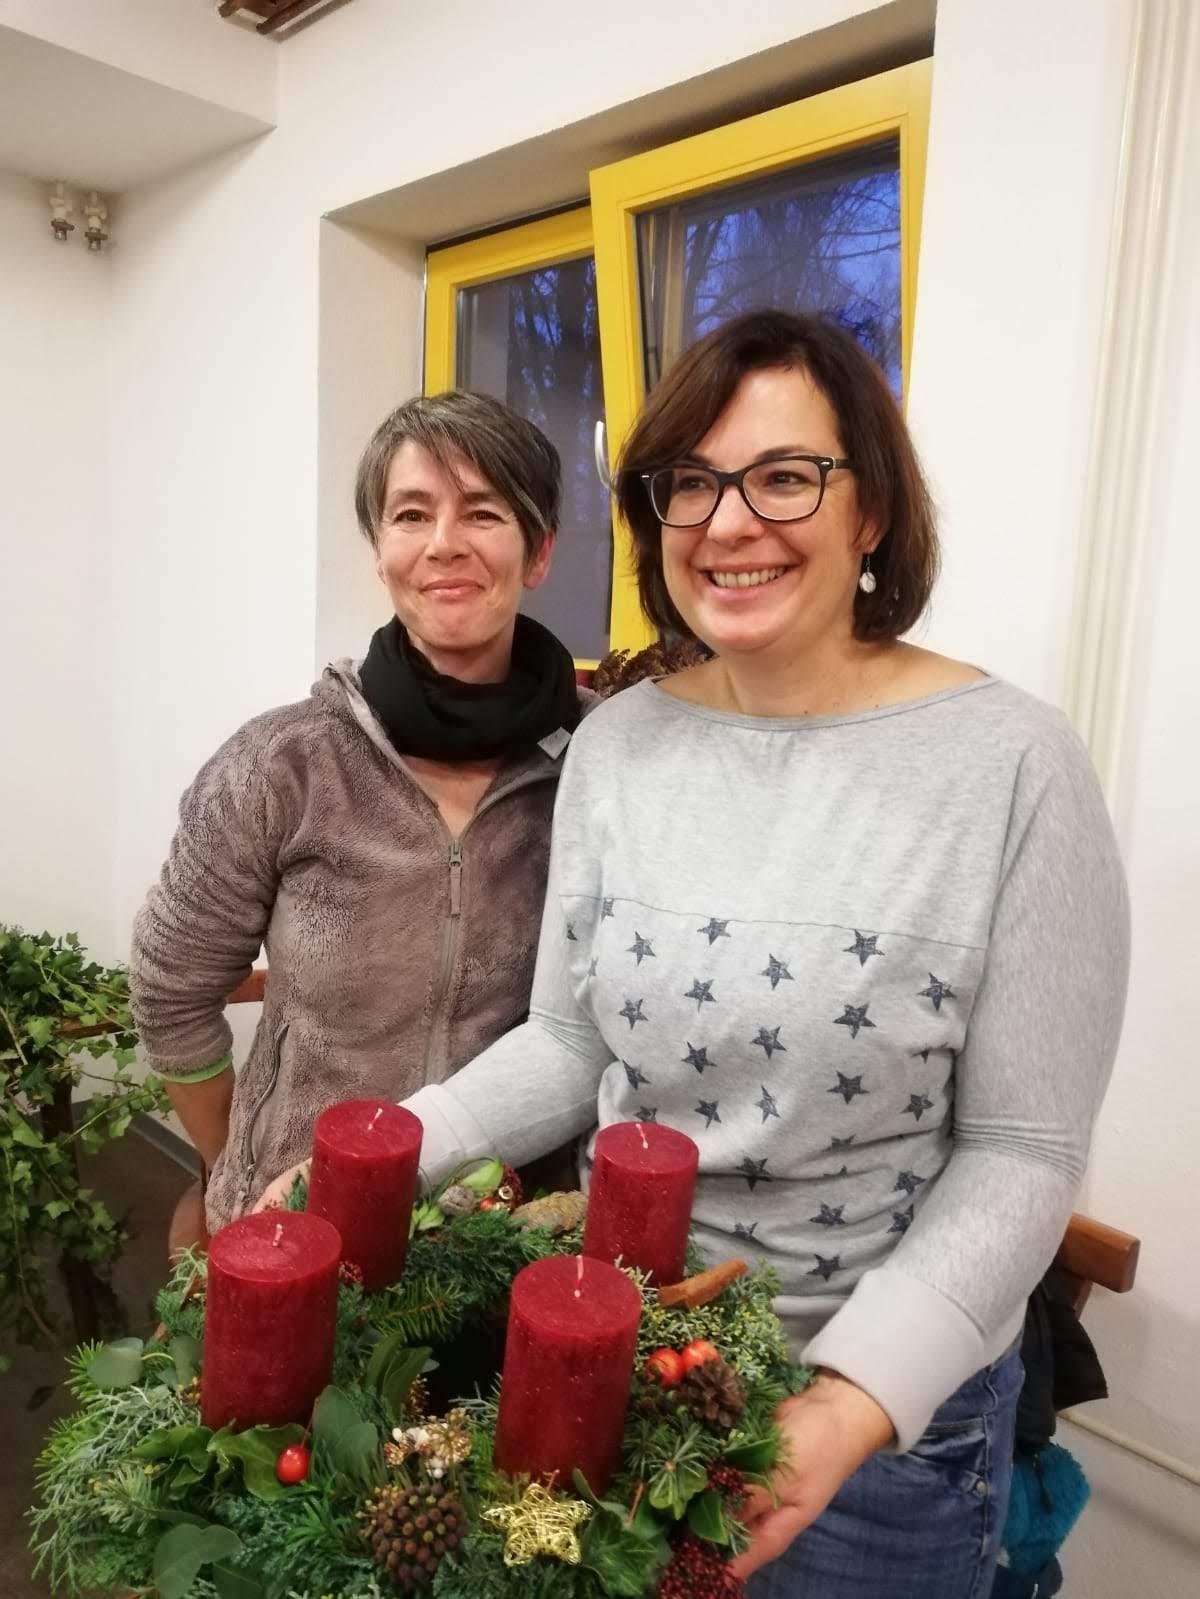 Ines + Katrin